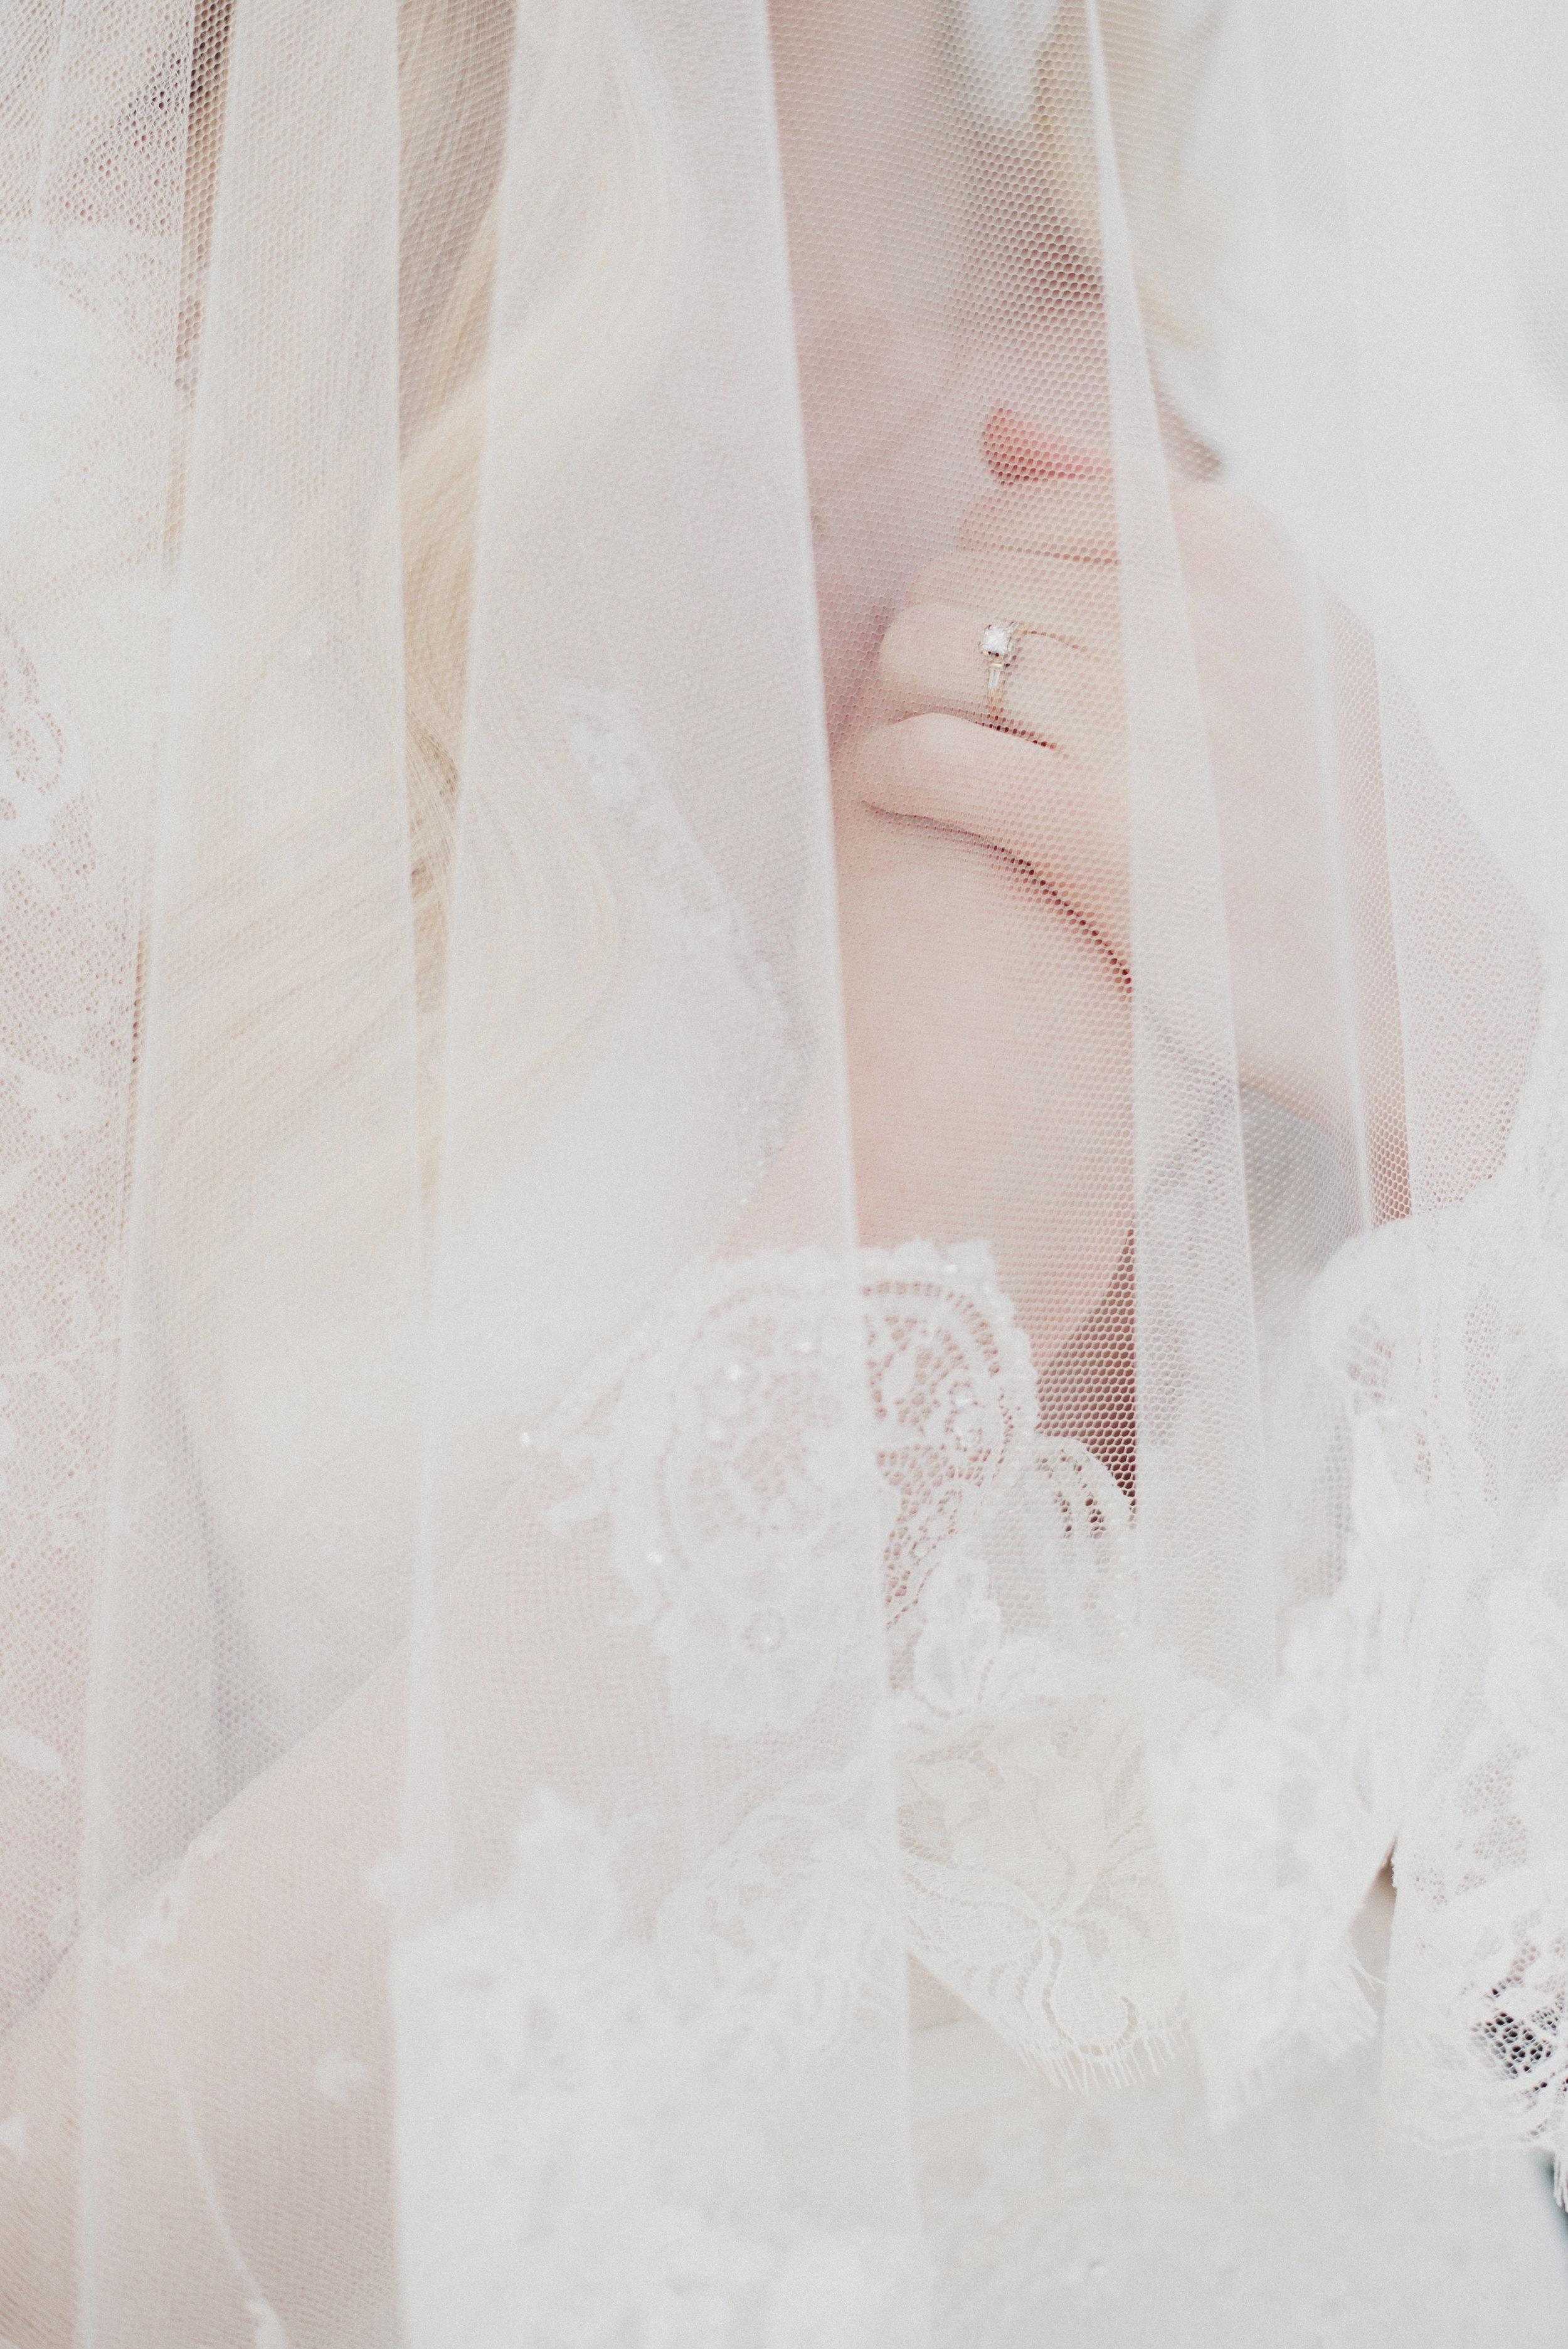 Veil wedding details